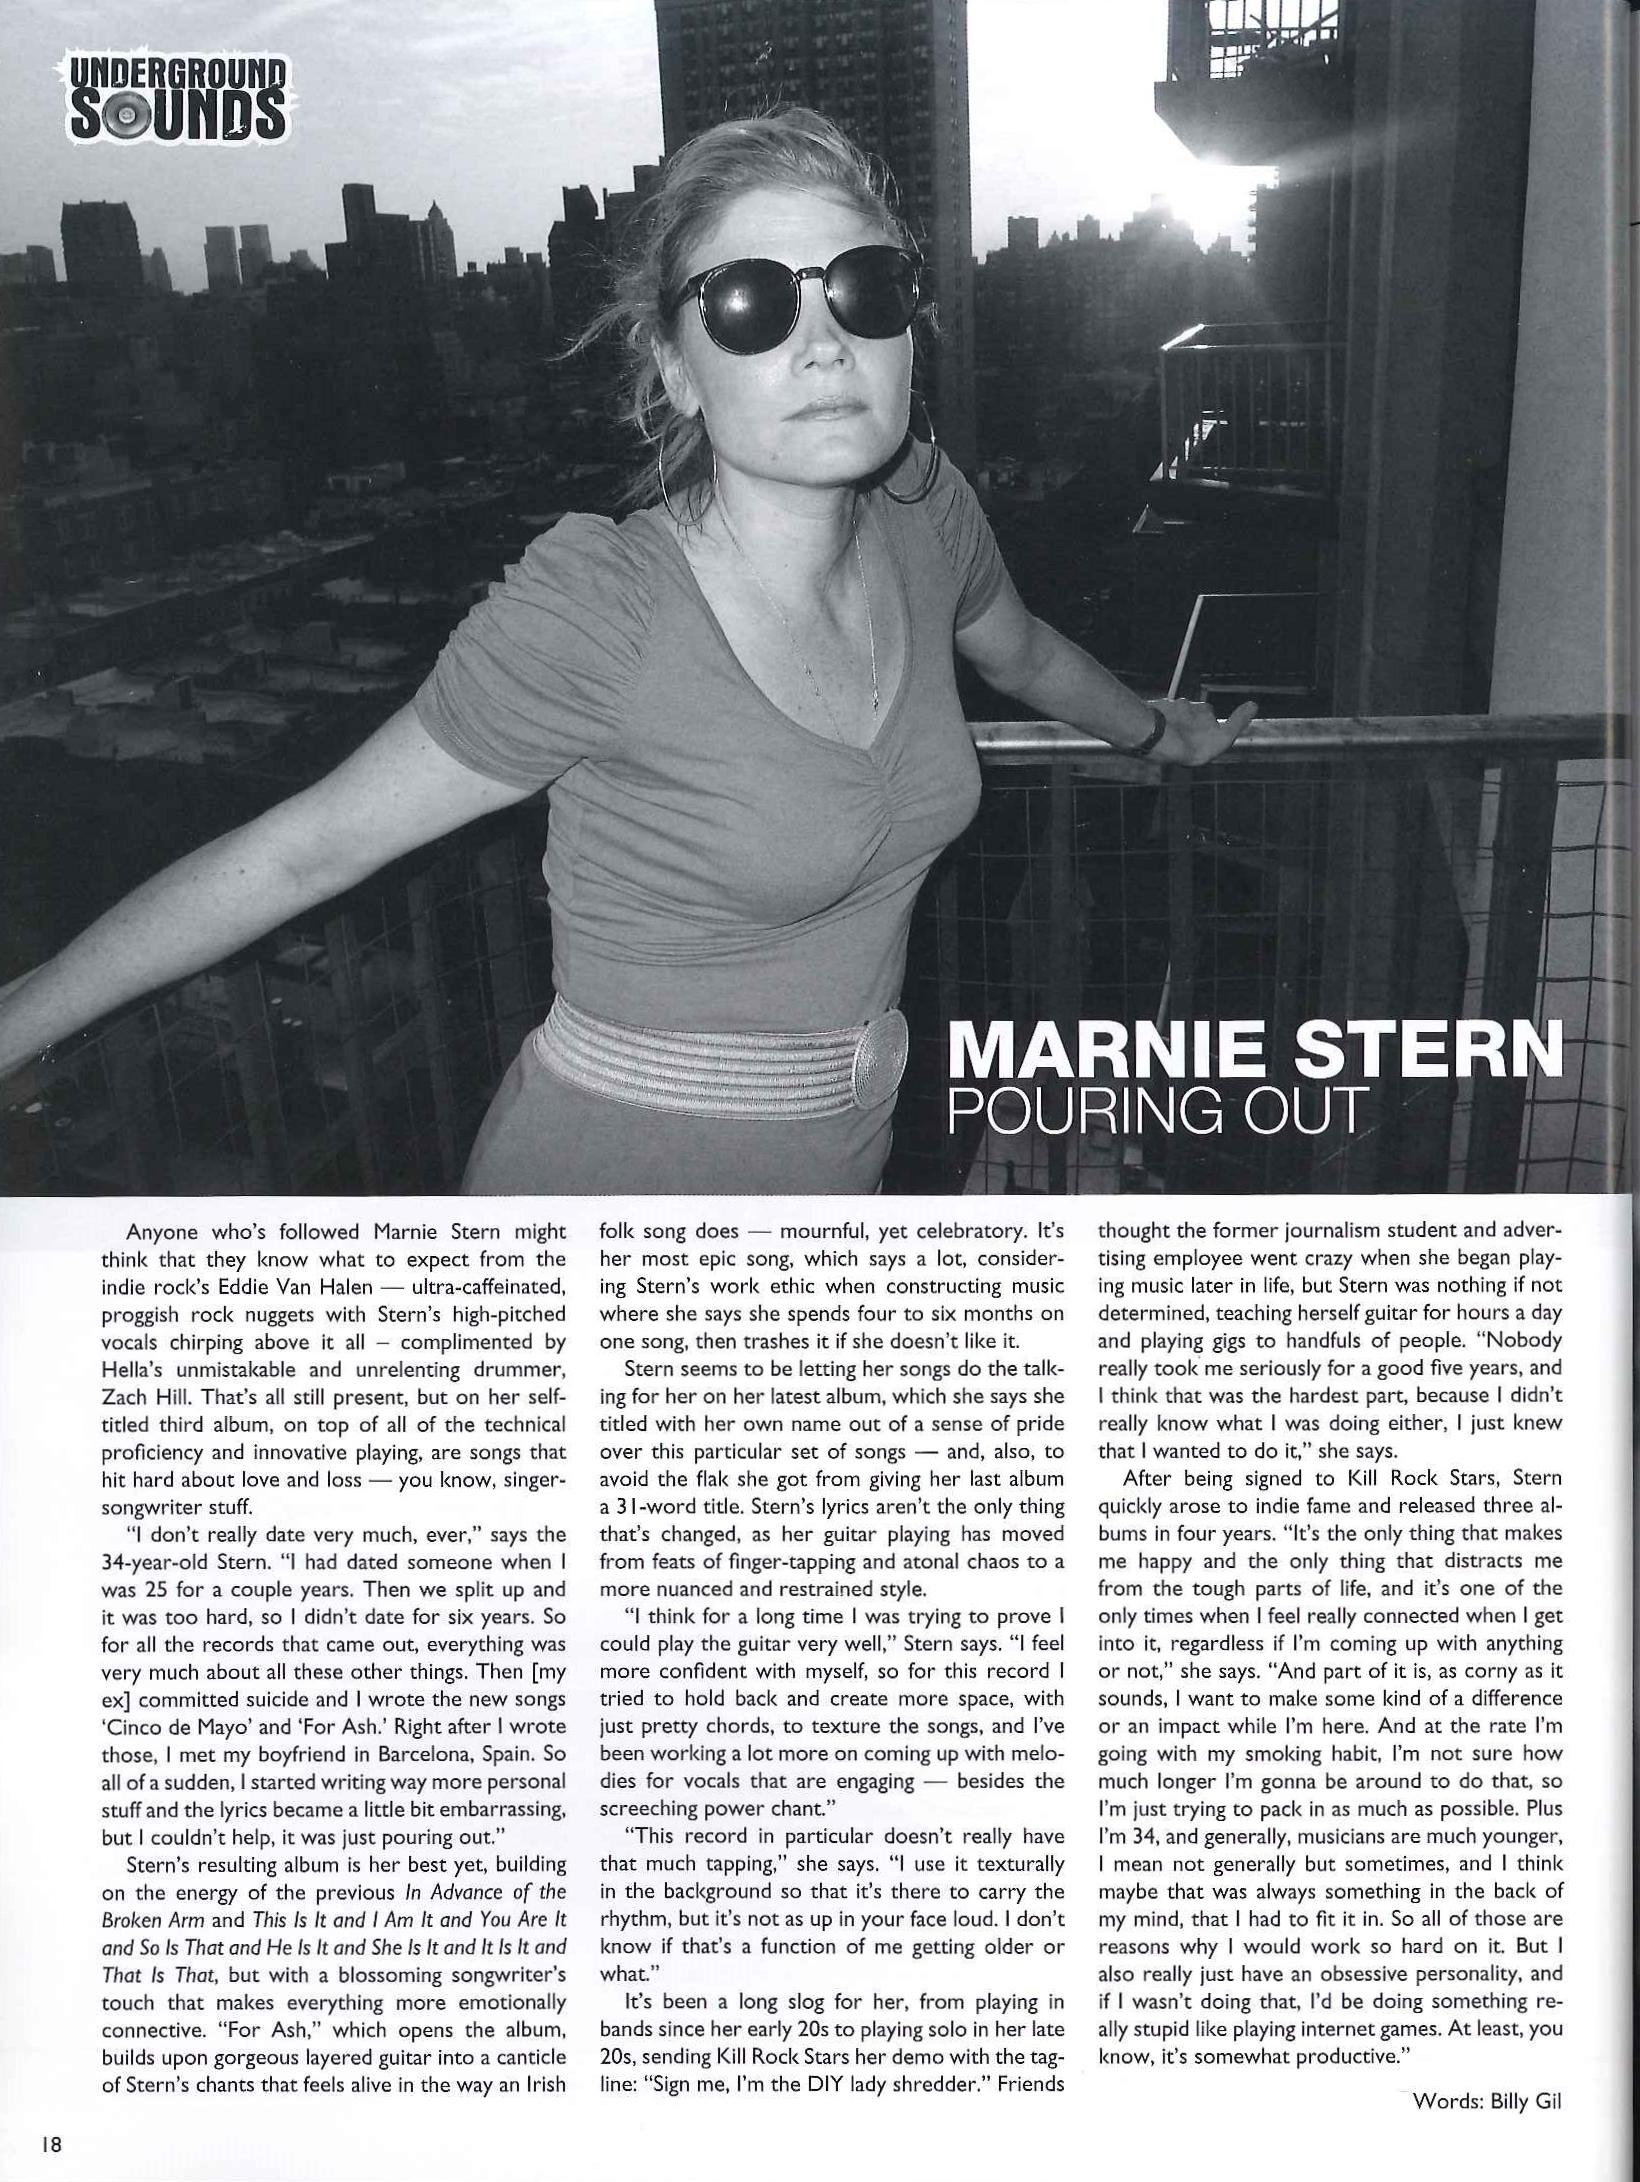 Marine Stern